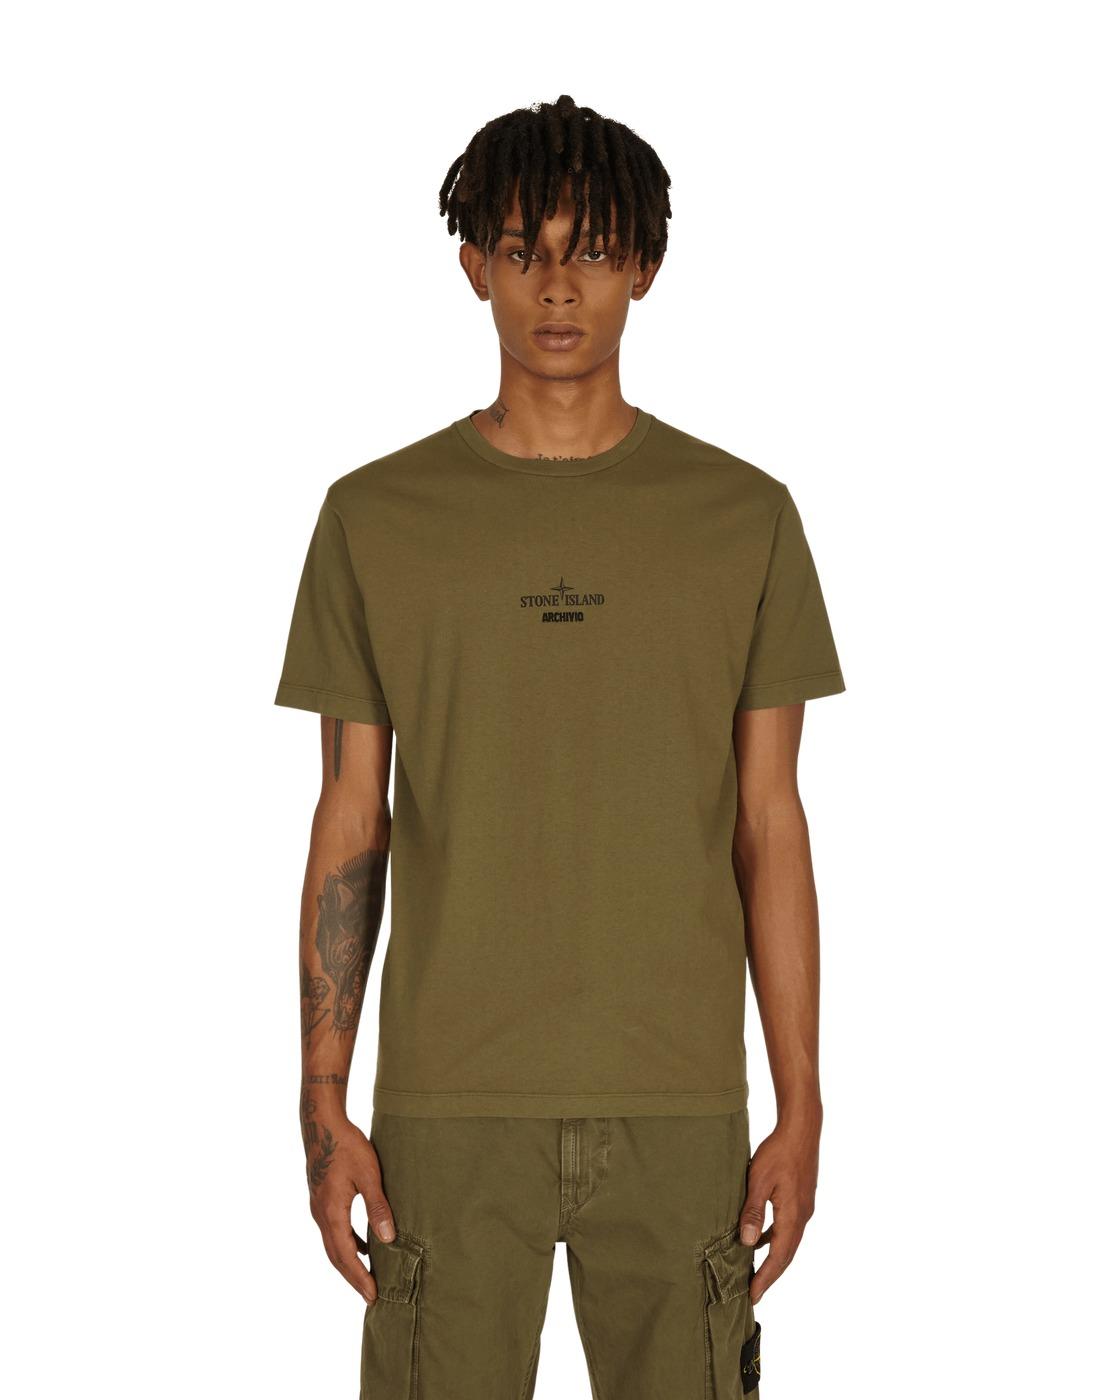 Stone Island Archivio T Shirt Olive Green